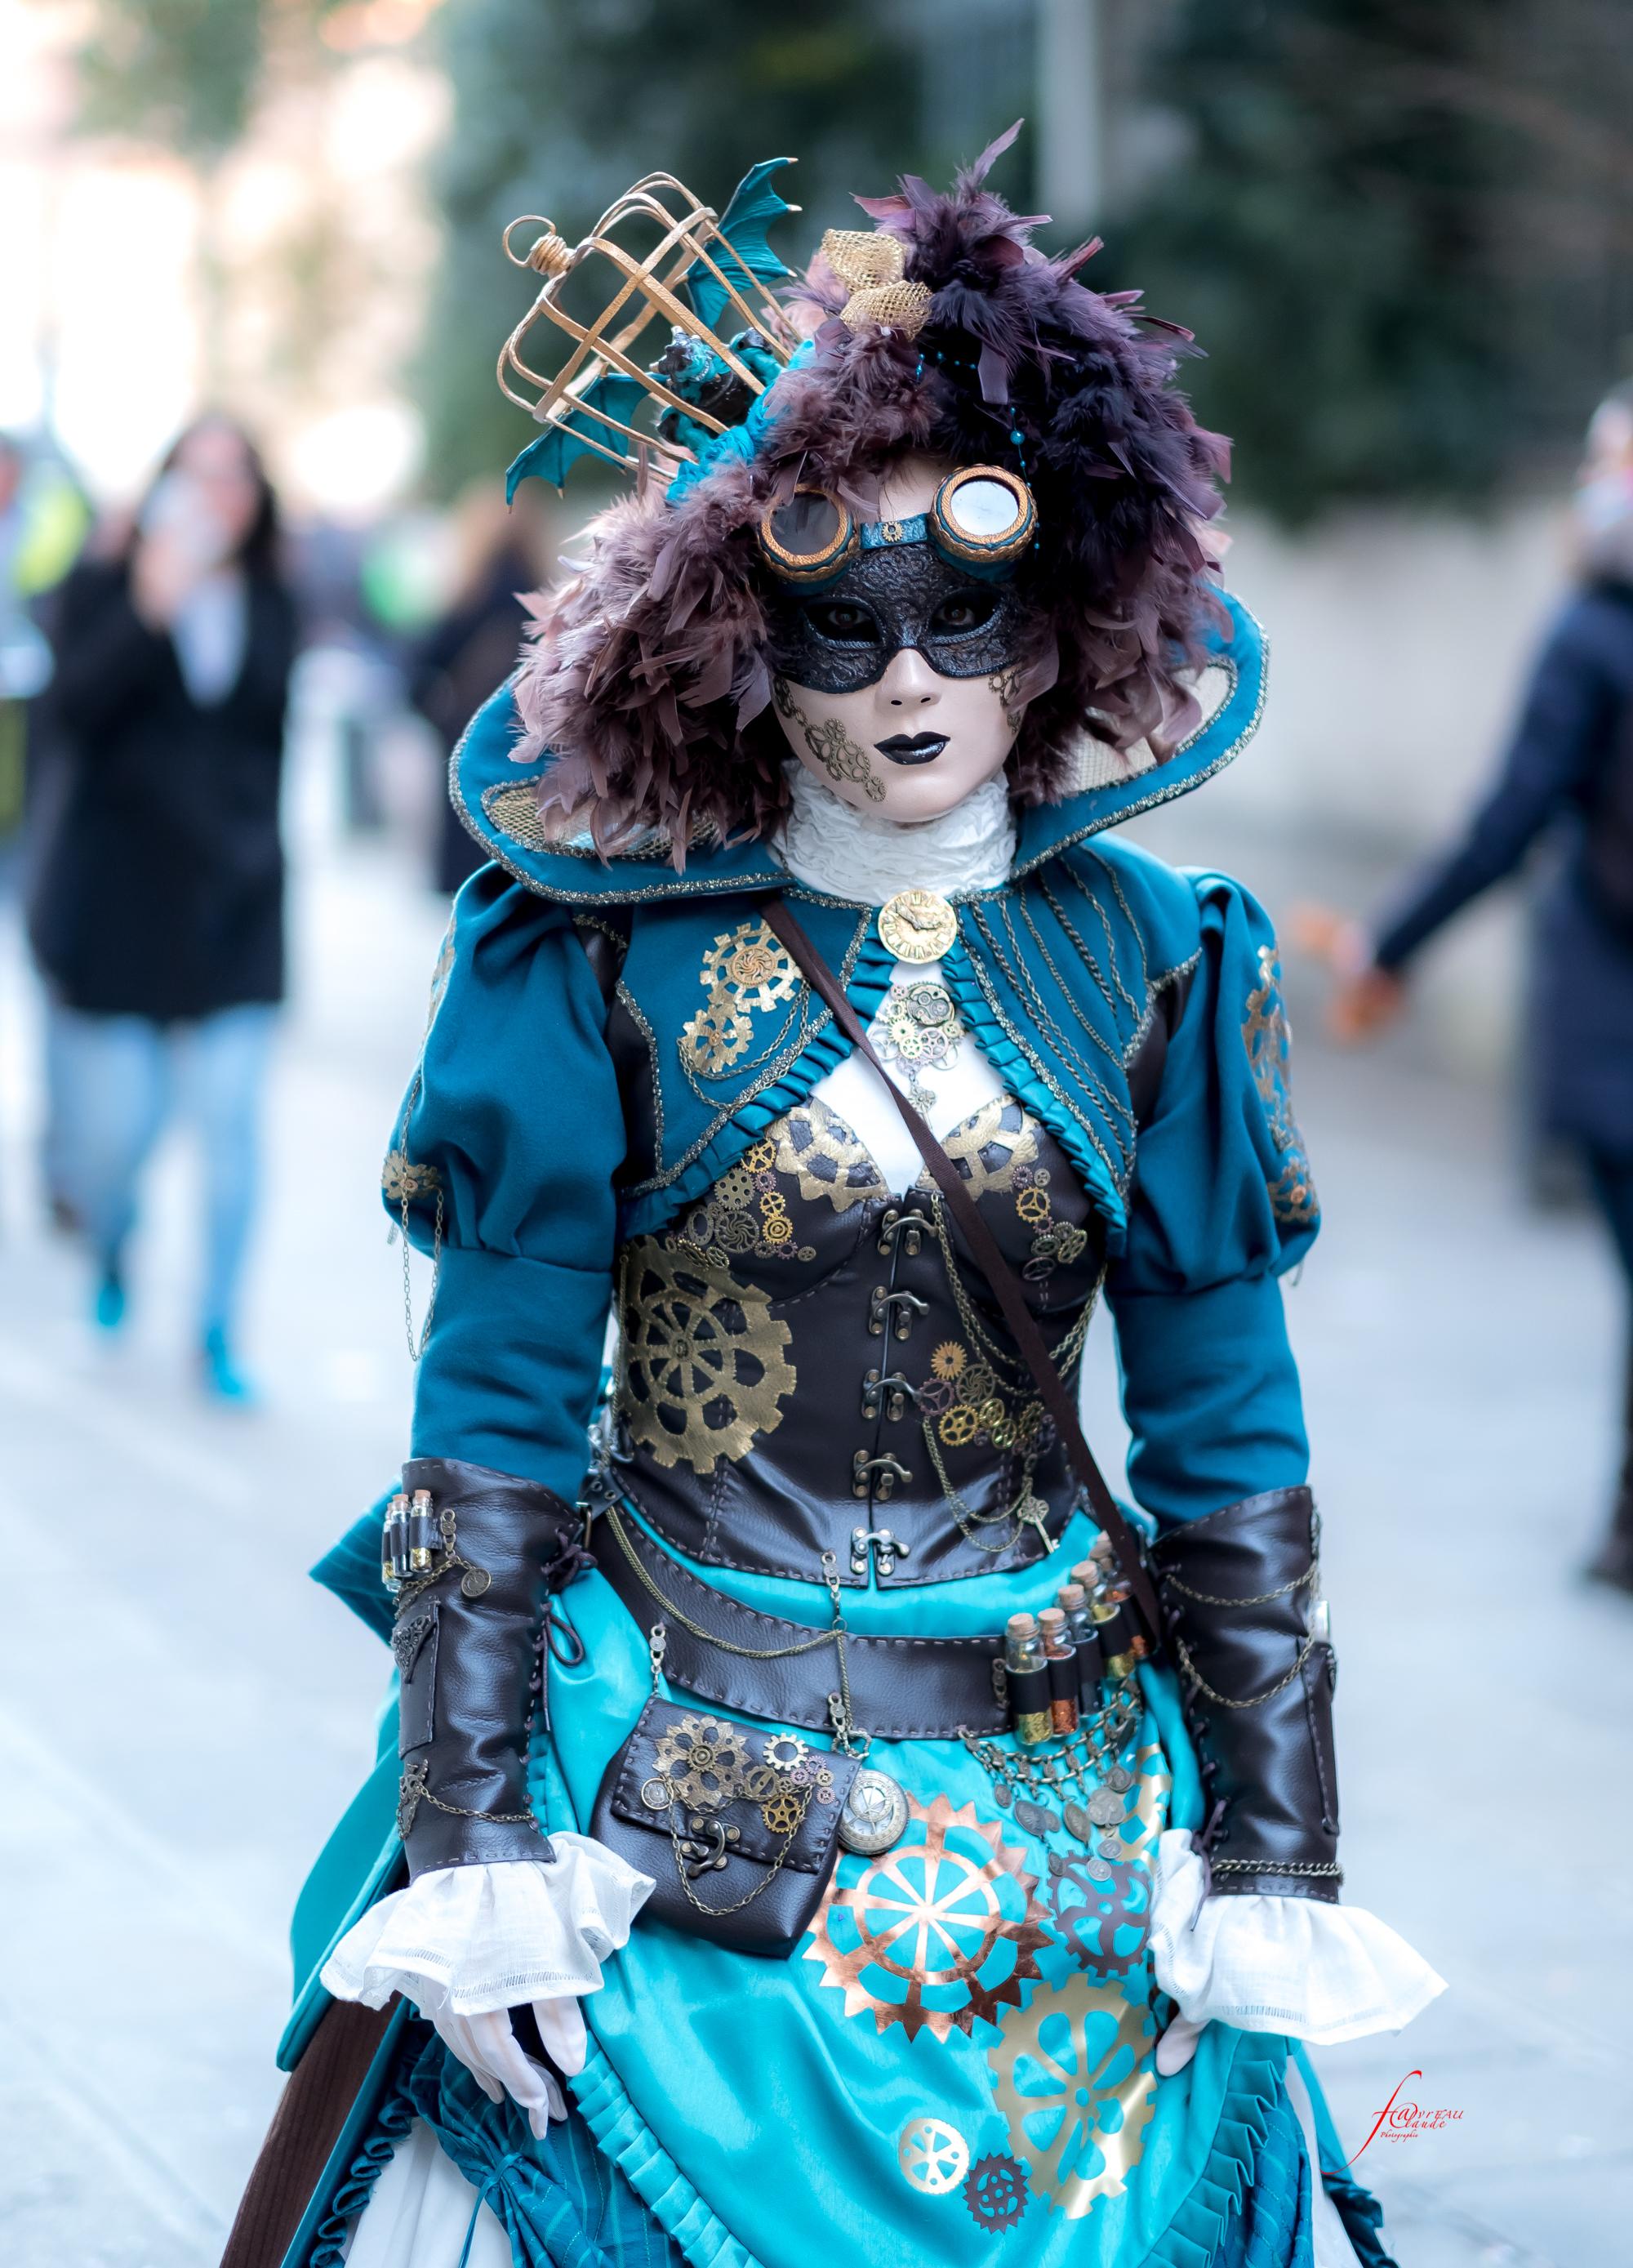 FAC-180217-Venise,Carnaval-14536-2